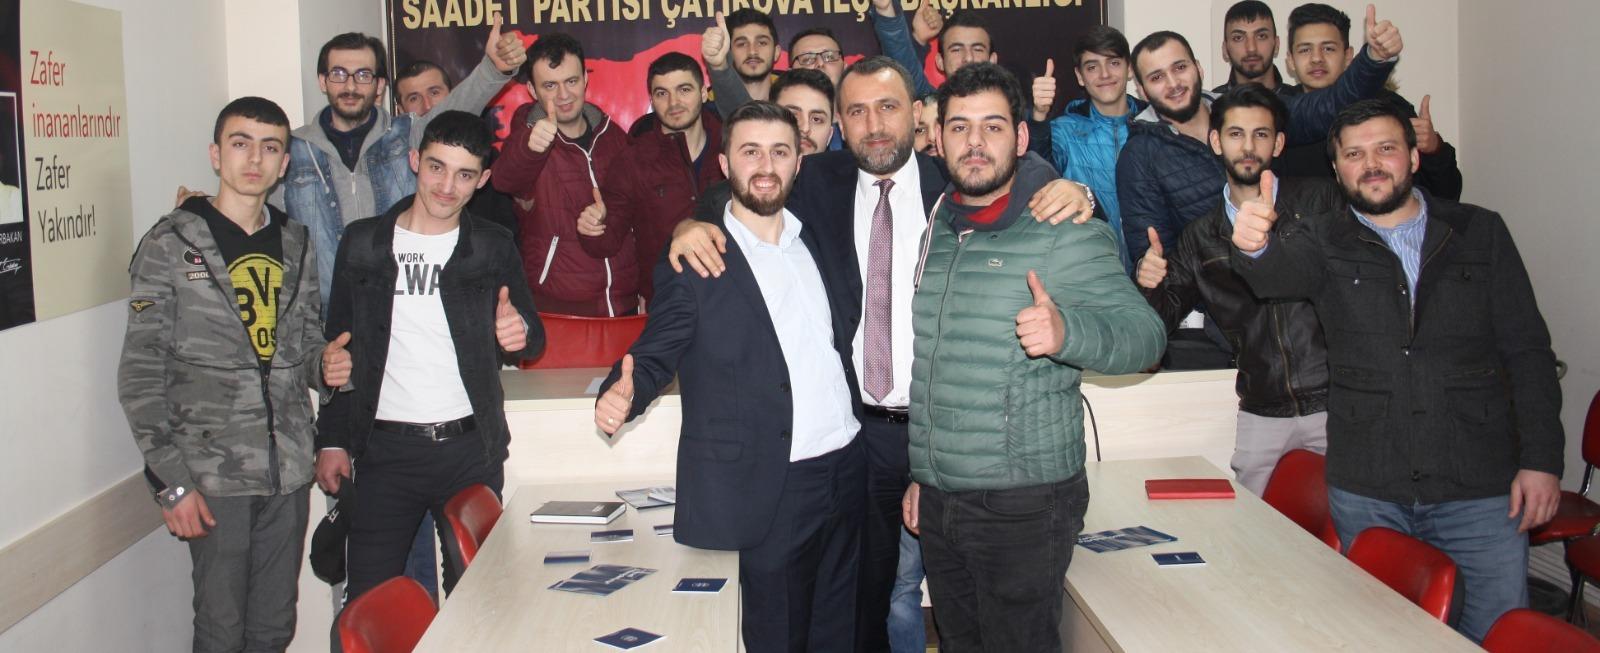 Saadet Partili gençlerden Aksu'ya tam destek